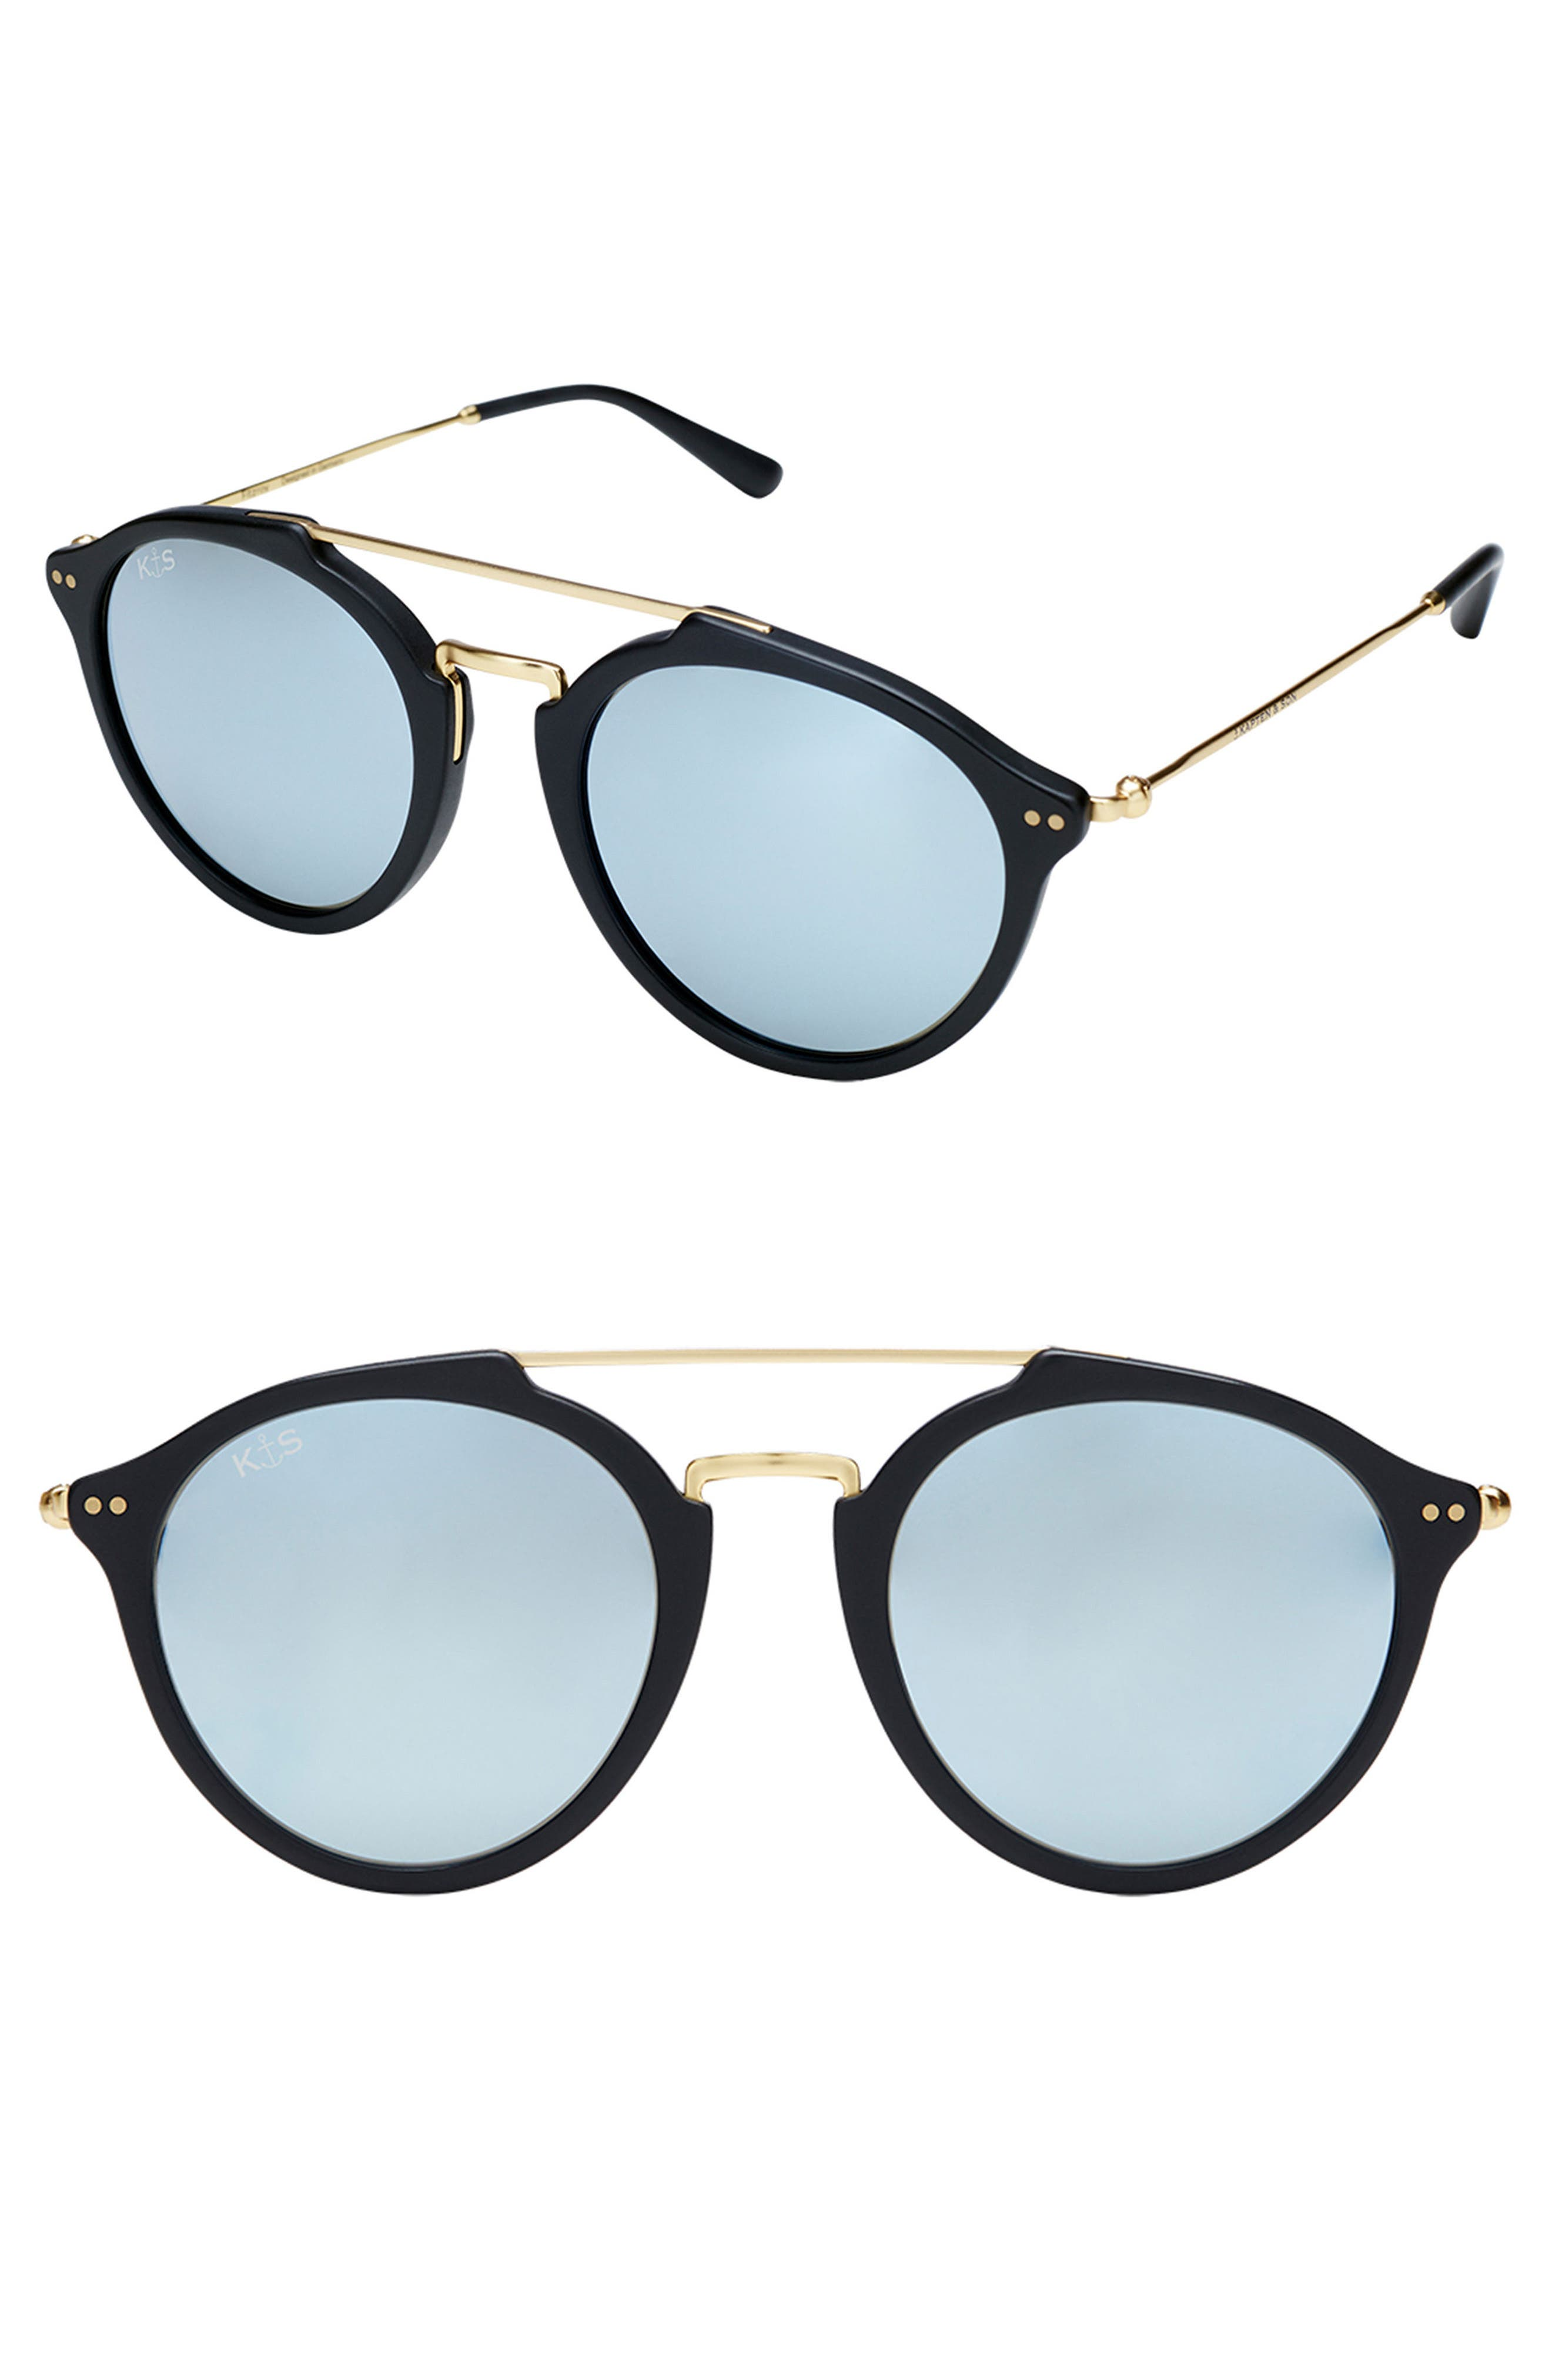 Fitzroy 48mm Sunglasses,                         Main,                         color, BLACK/ BLUE